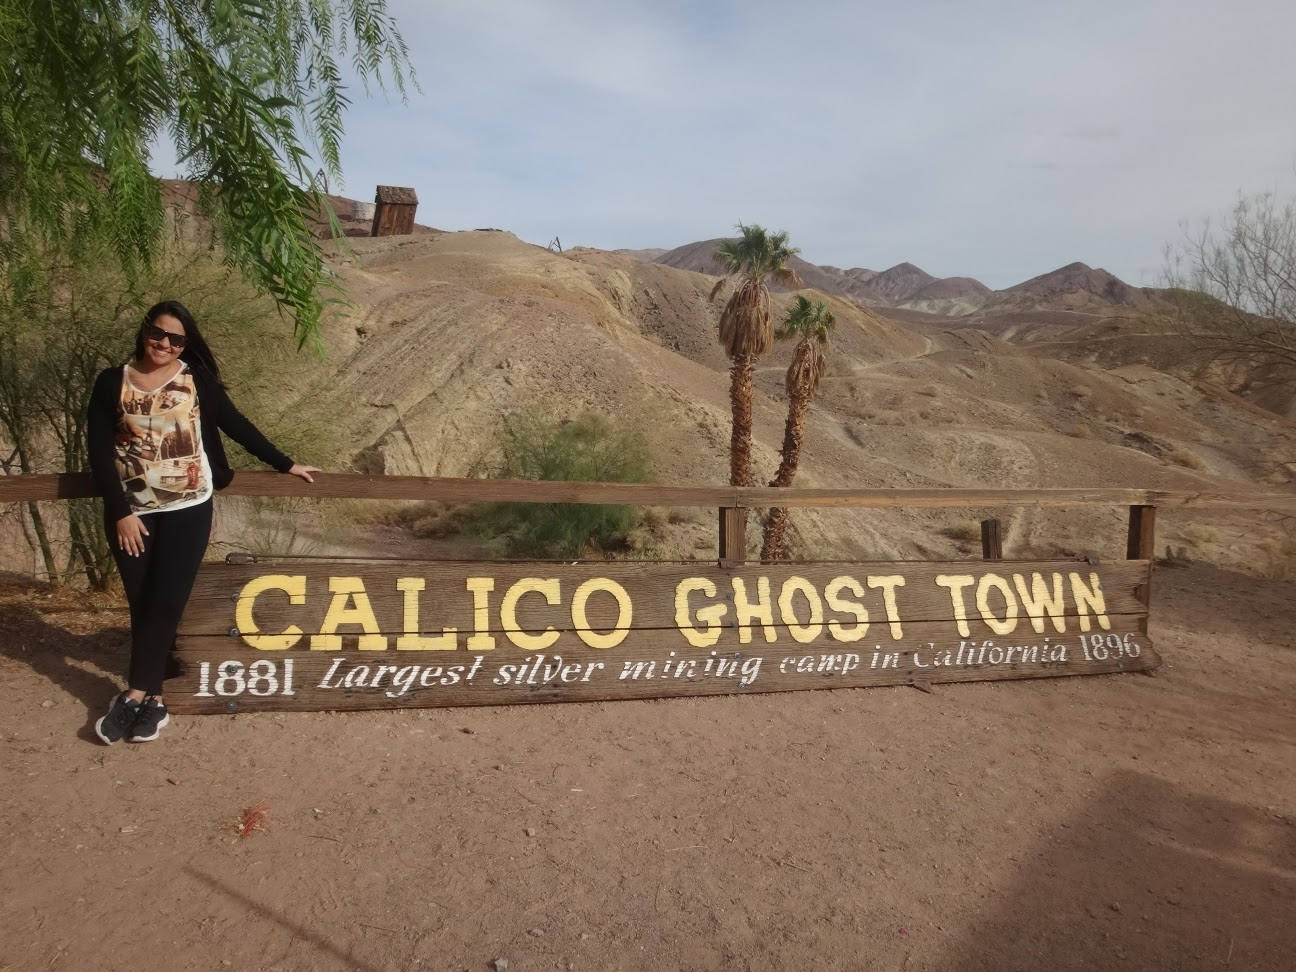 caligo ghost town - cidade fantasma